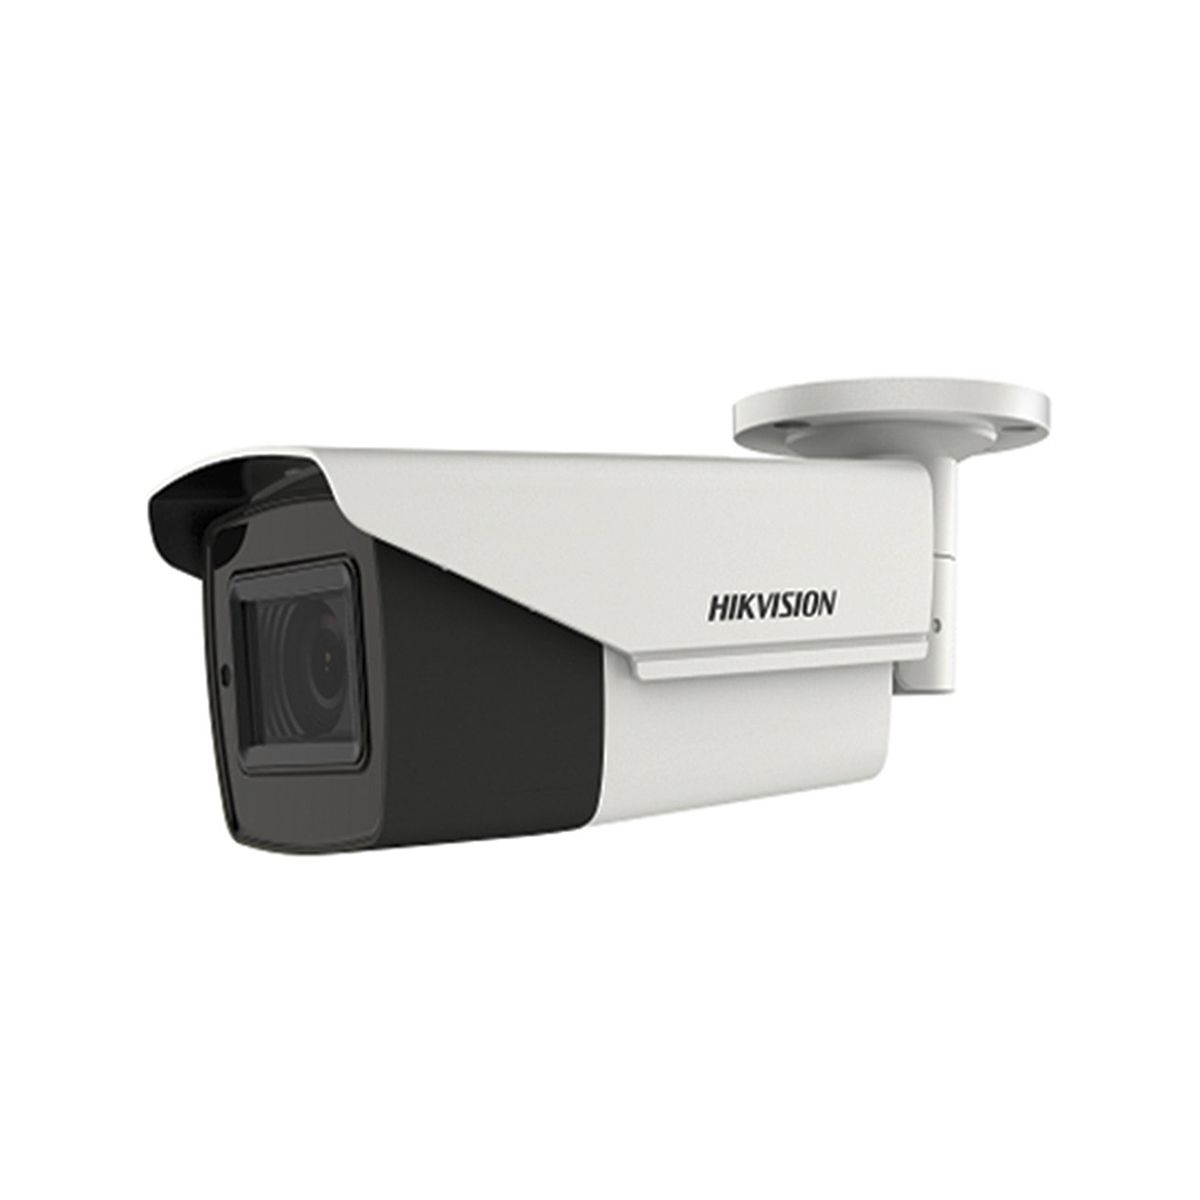 Cámara Hikvision Turbo HD Tipo Bullet DS-2CE19U1T-IT3ZF 2.7MM/13.5MM